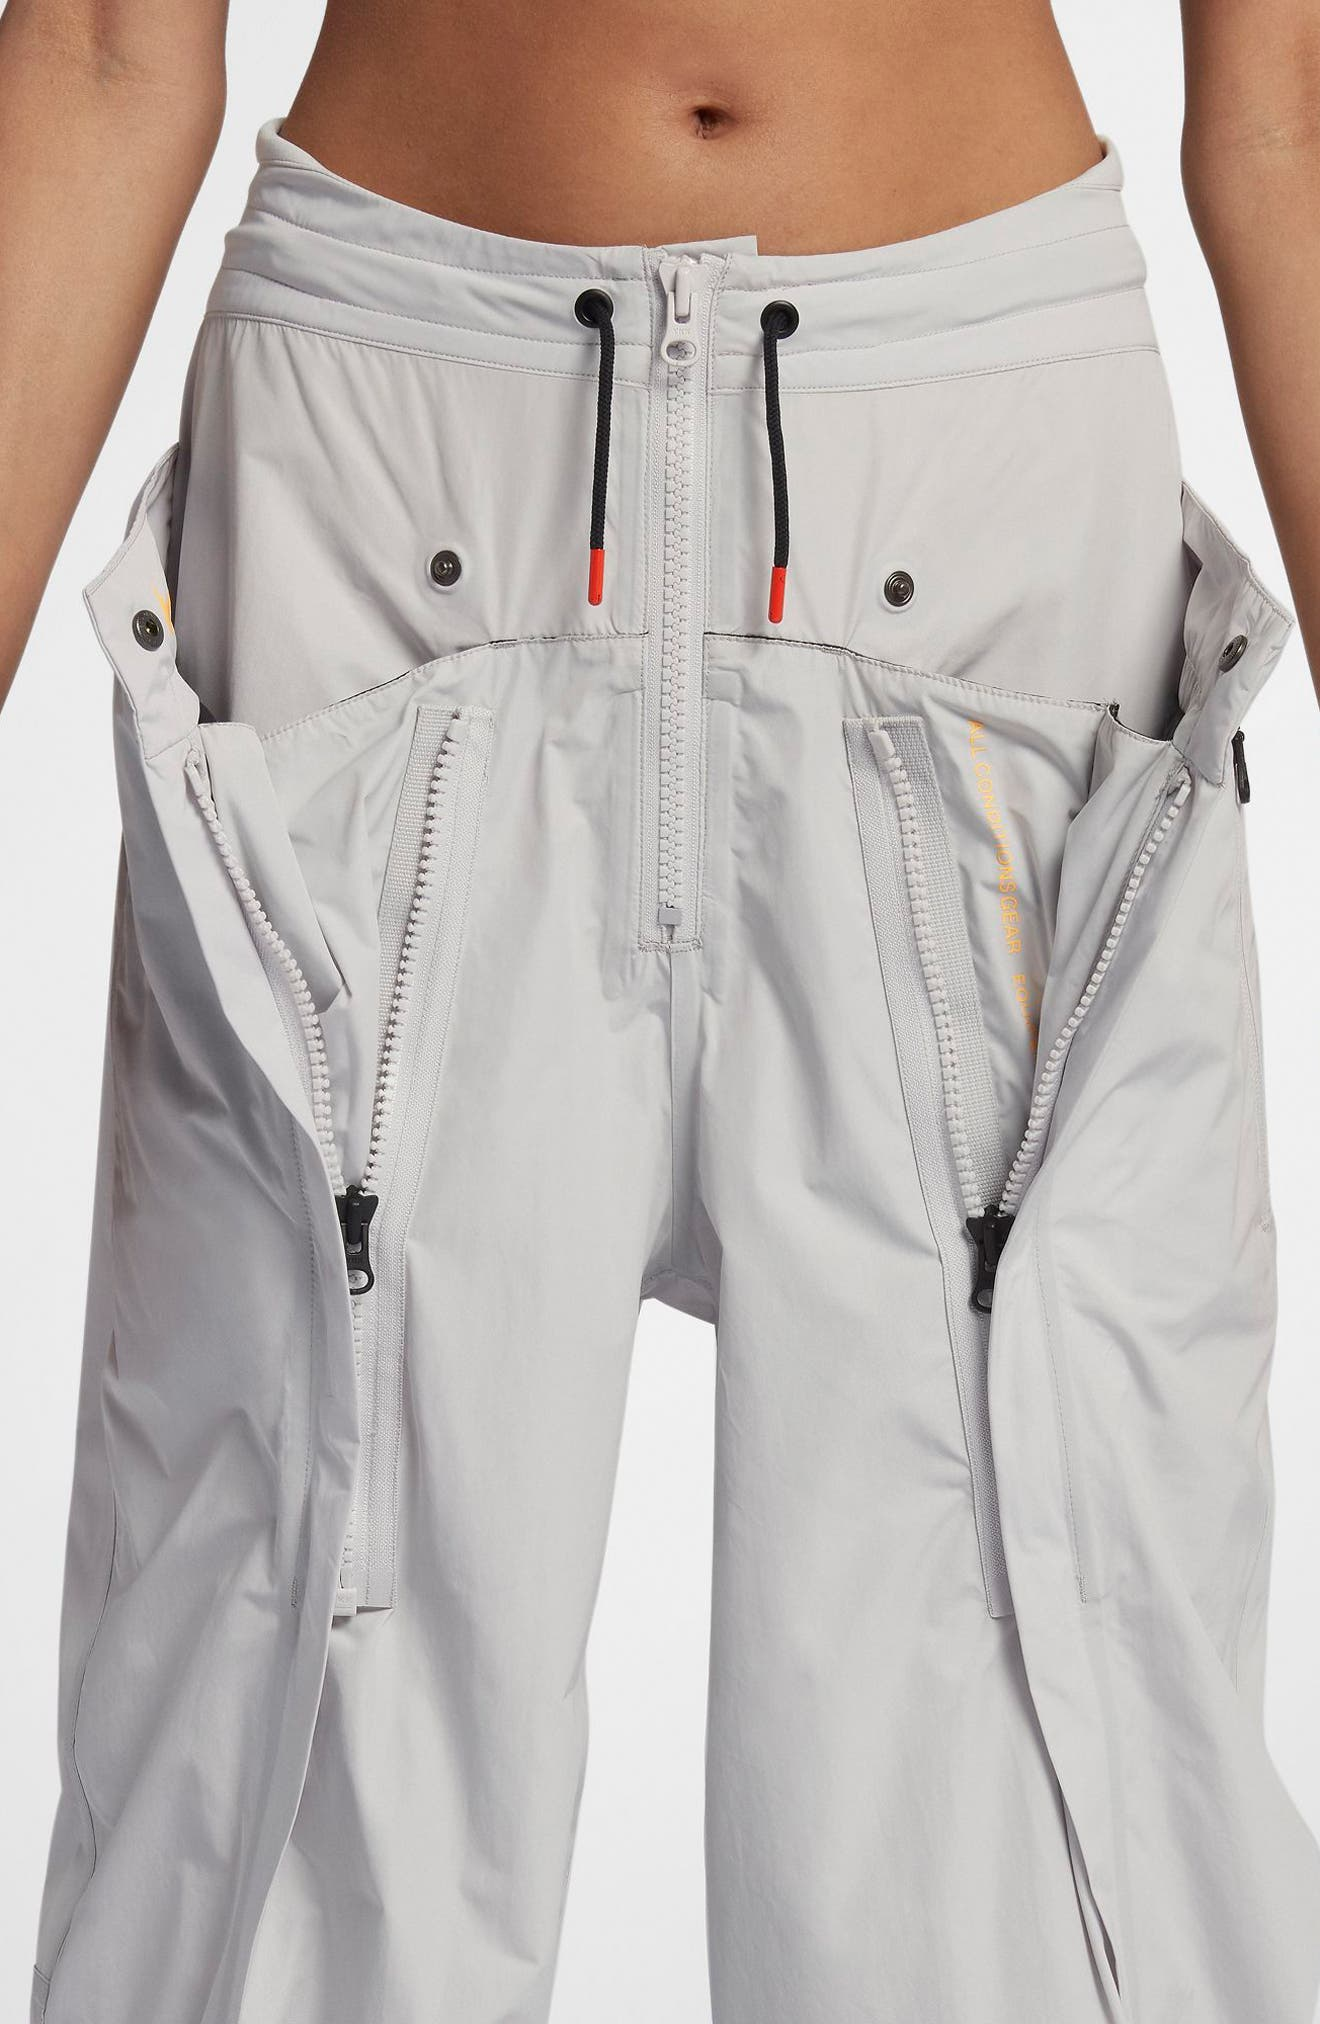 NikeLab ACG Women's Cargo Pants,                             Alternate thumbnail 4, color,                             Vast Grey